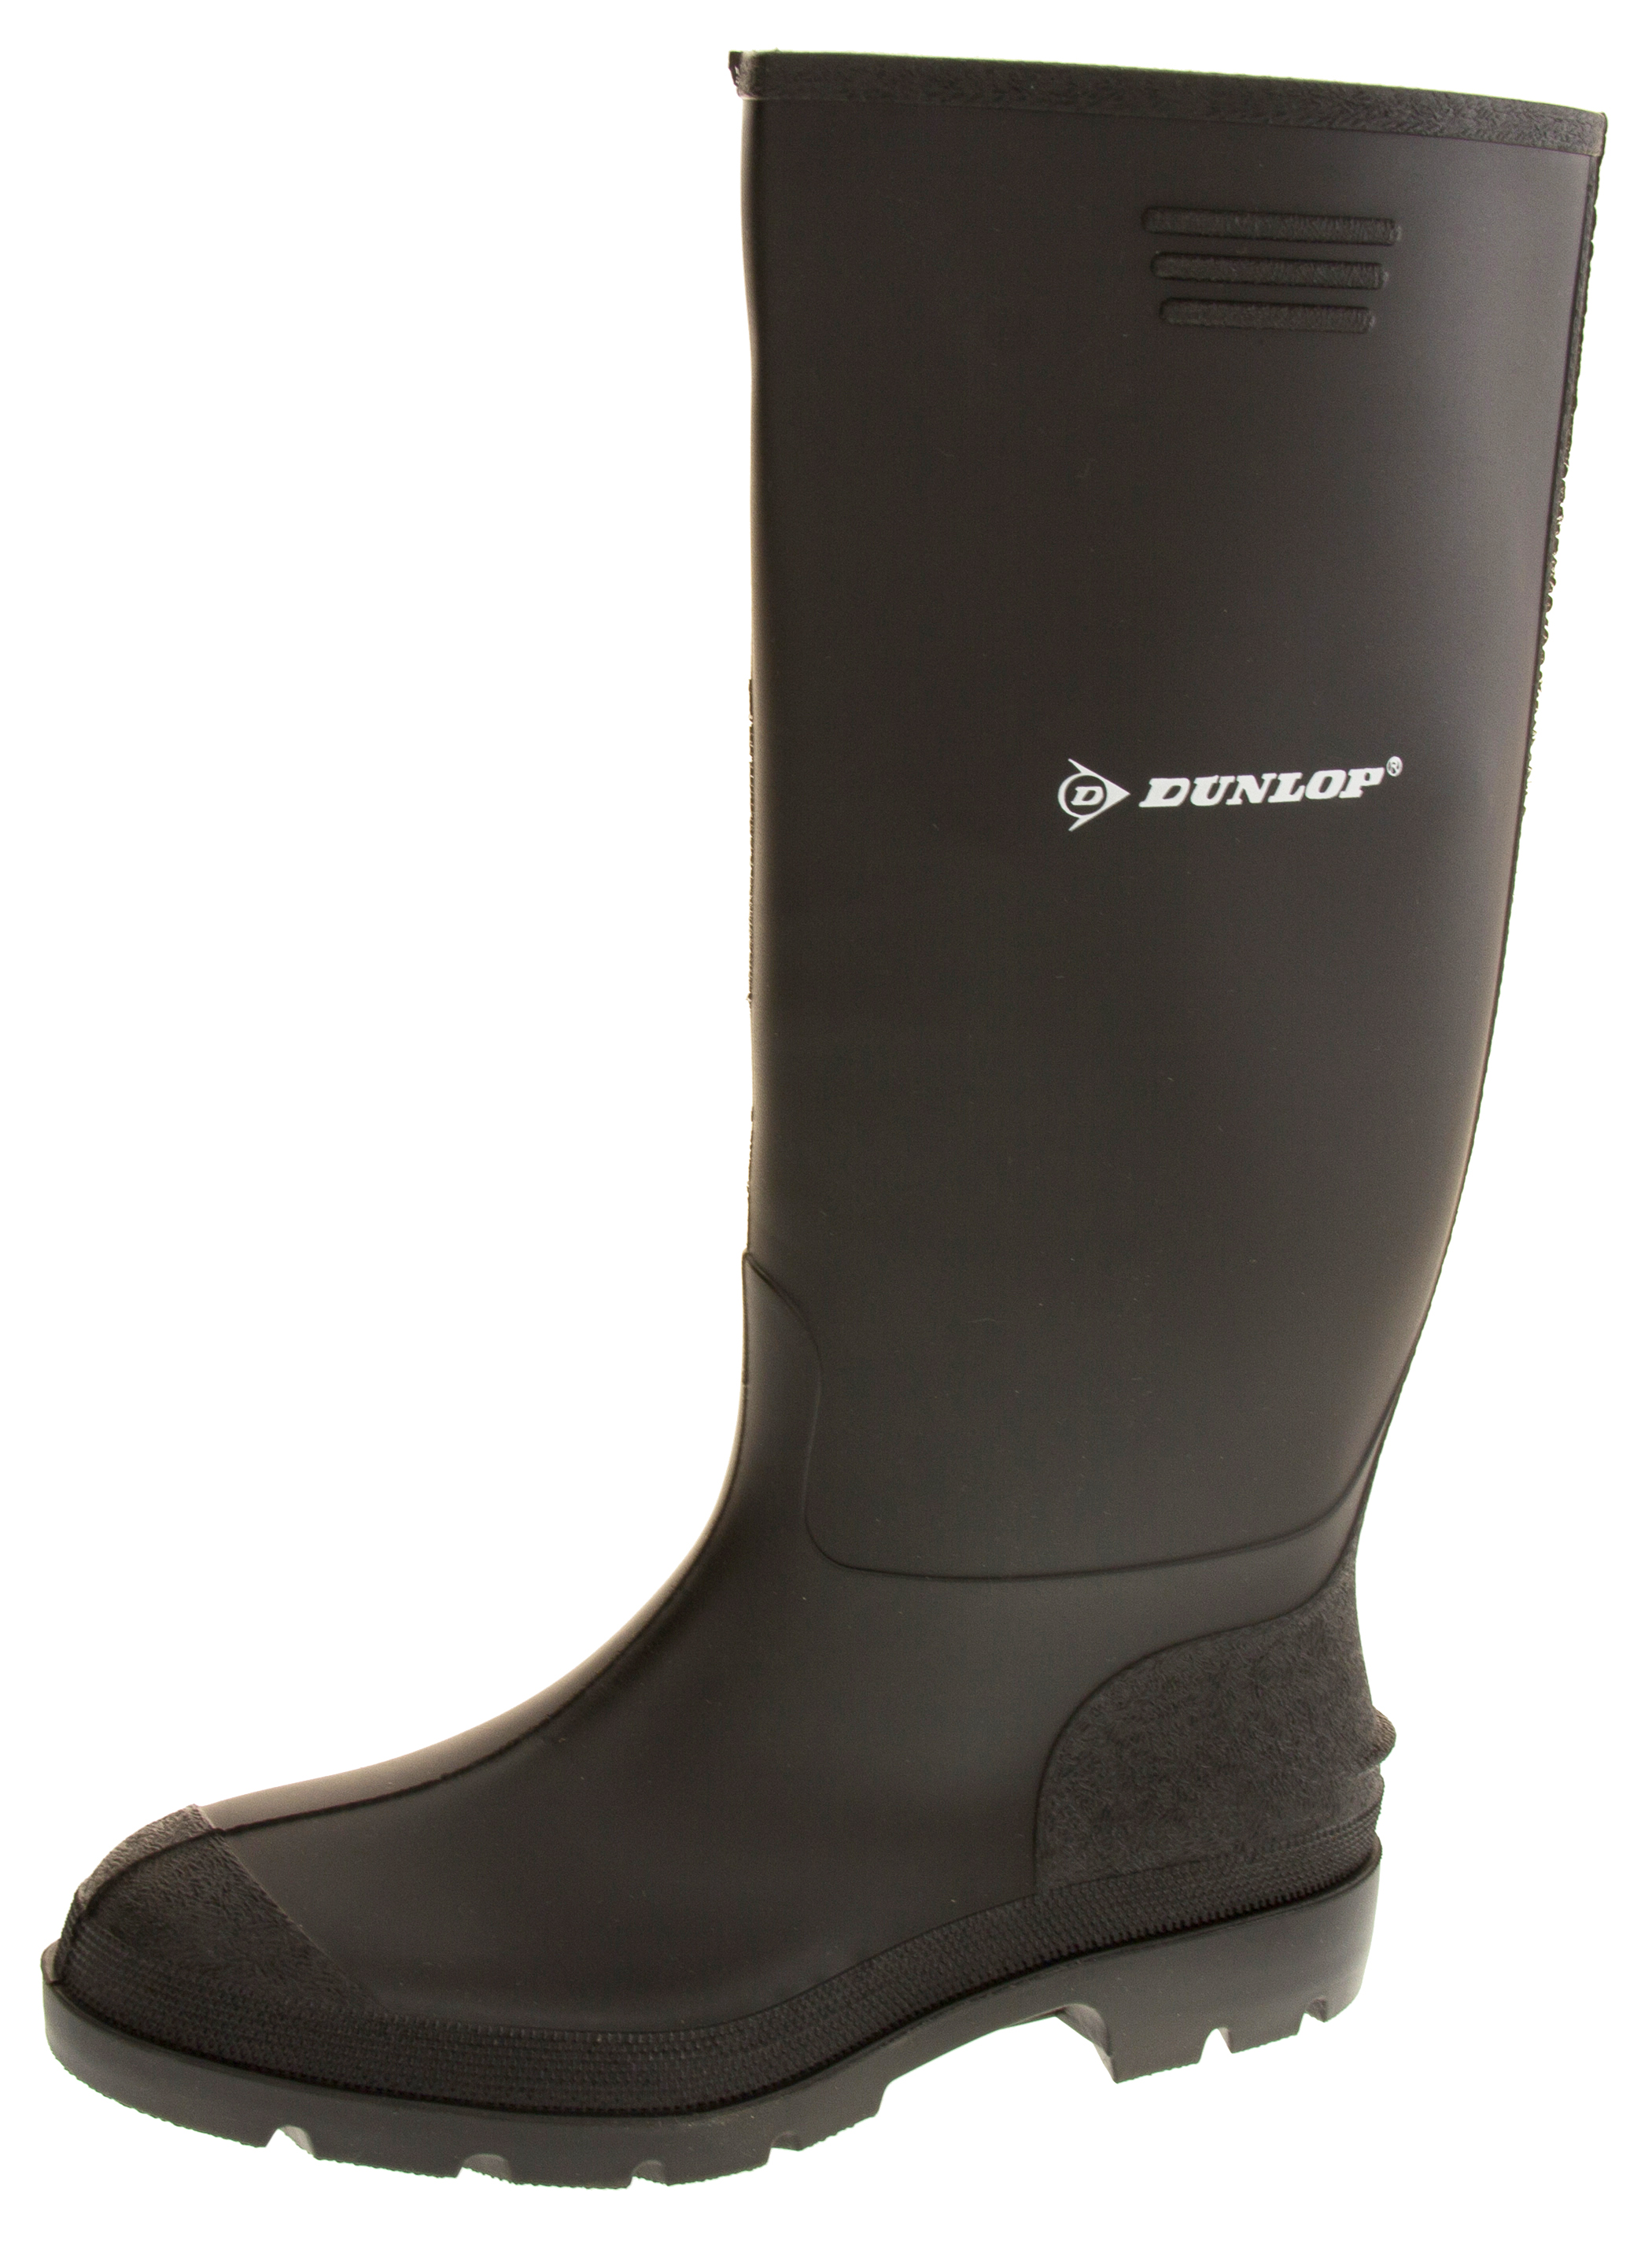 Mens Dunlop Wellington Boots Waterproof Gardening Wellies